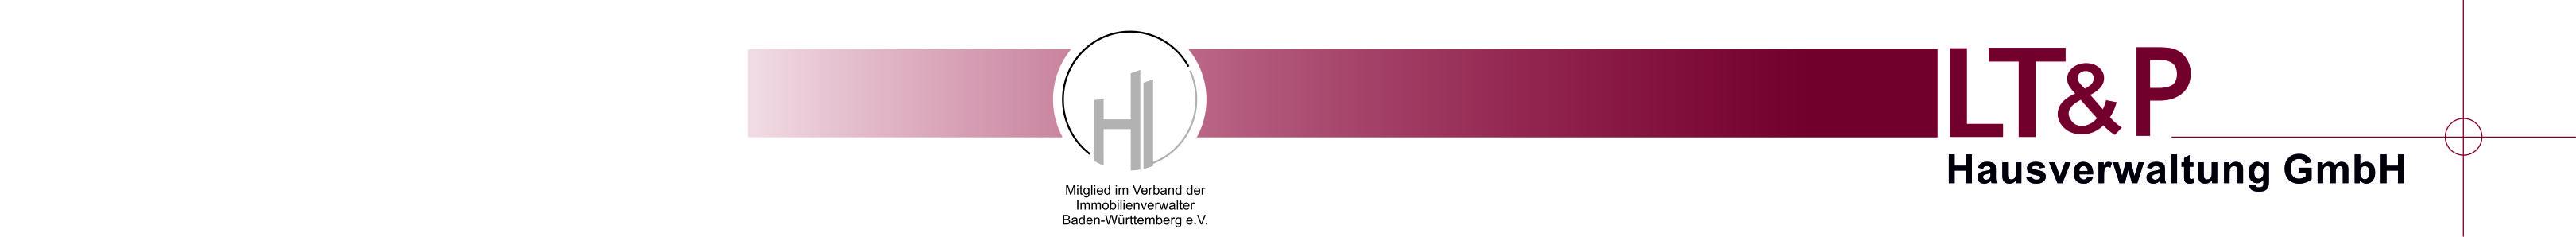 LT&P Hausverwaltung GmbH